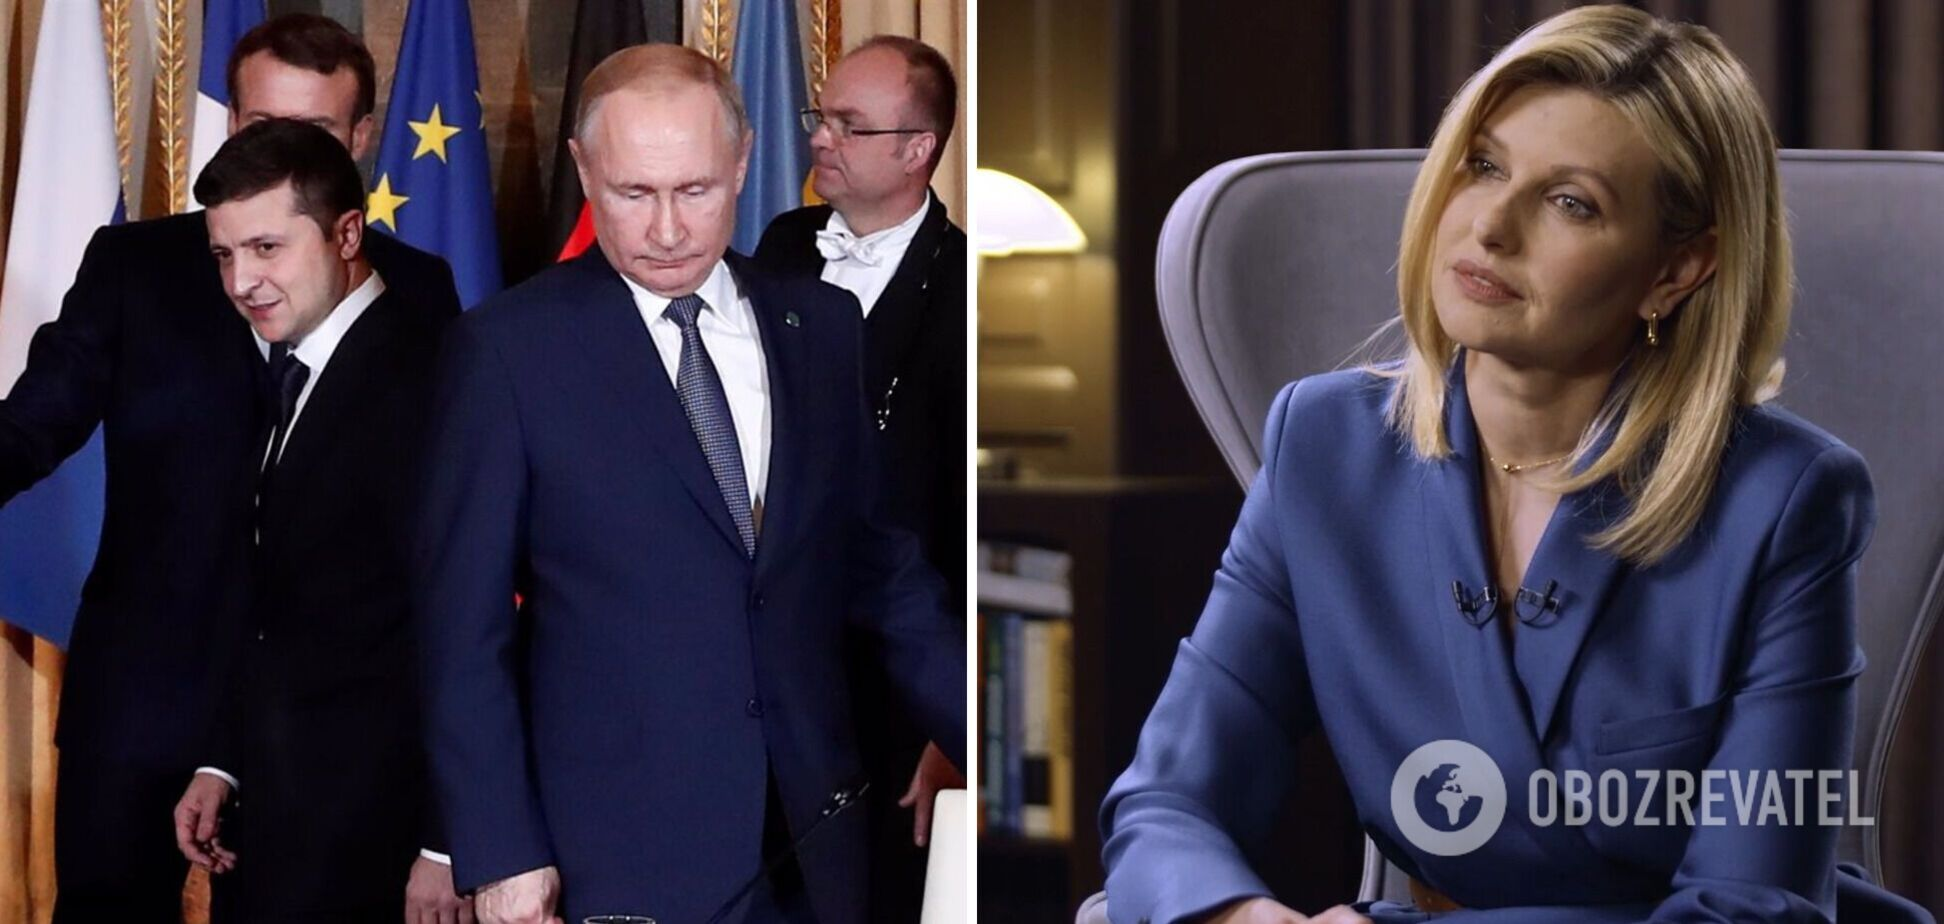 Дружина Зеленського – про поїздку 'дивитися в очі' Путіну: президент принесе мир в Україну